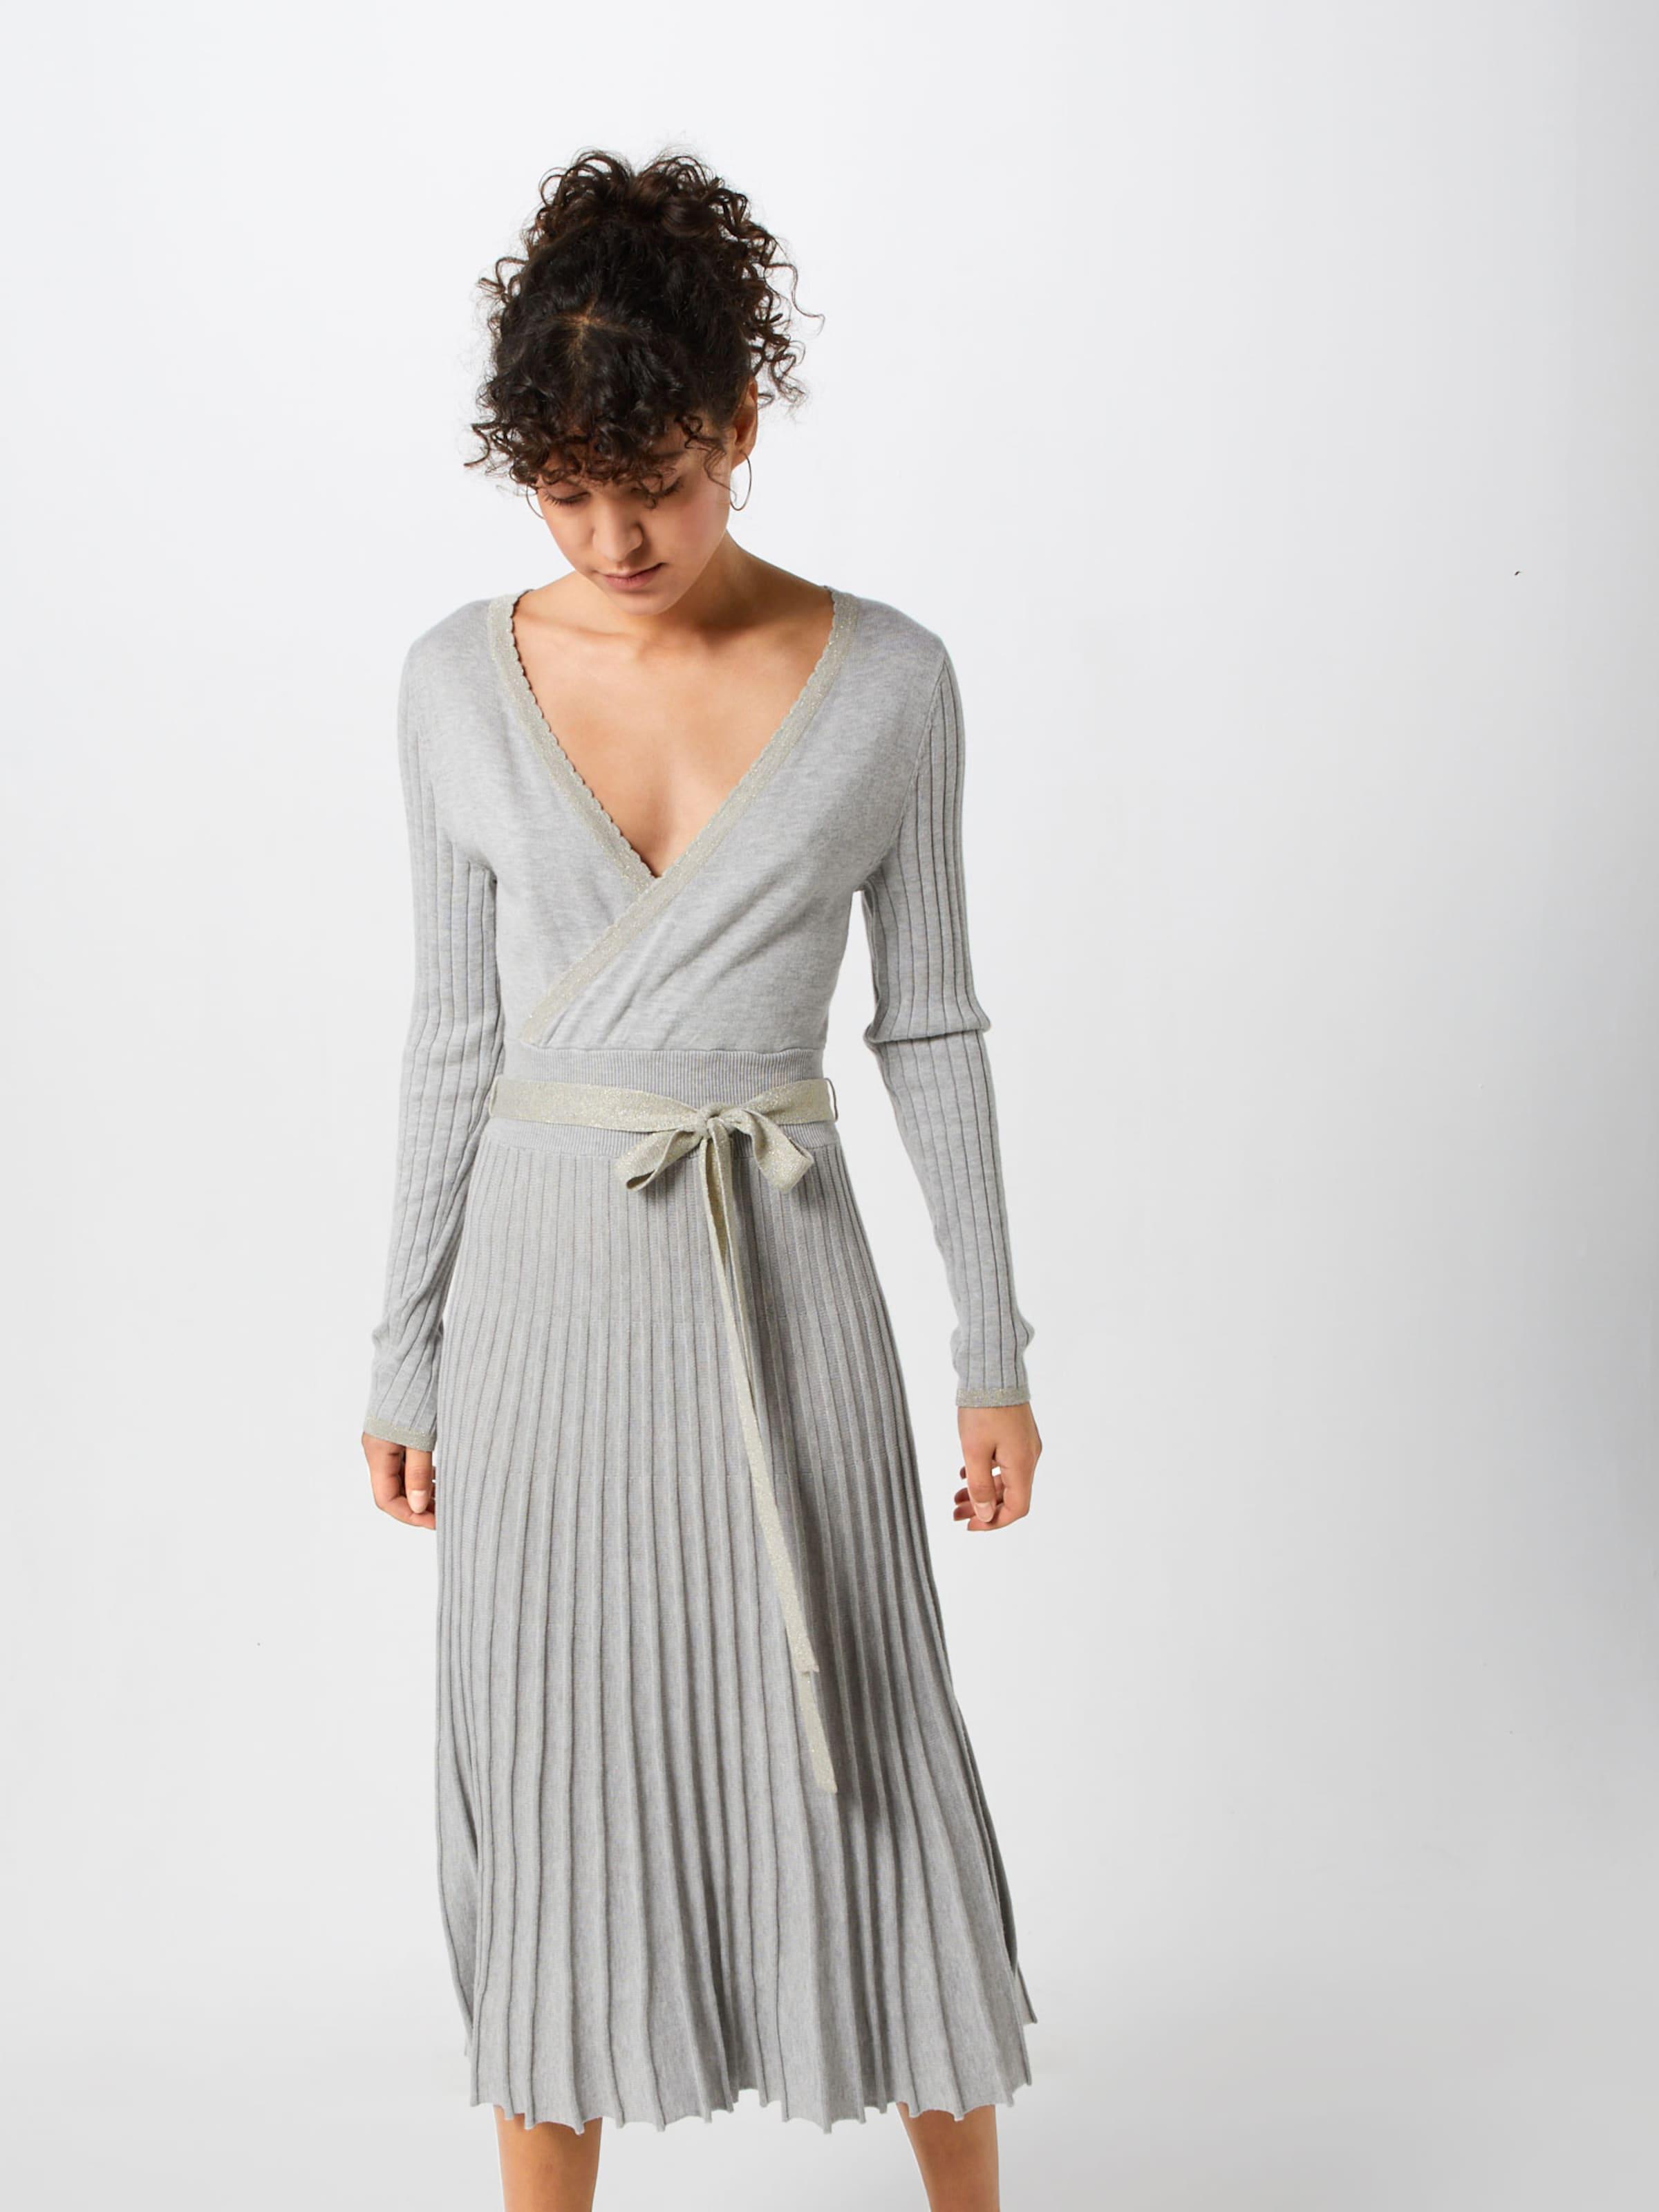 Maille 'clary En Gris Cream Robes Knit Dress' Clair w80nOPk